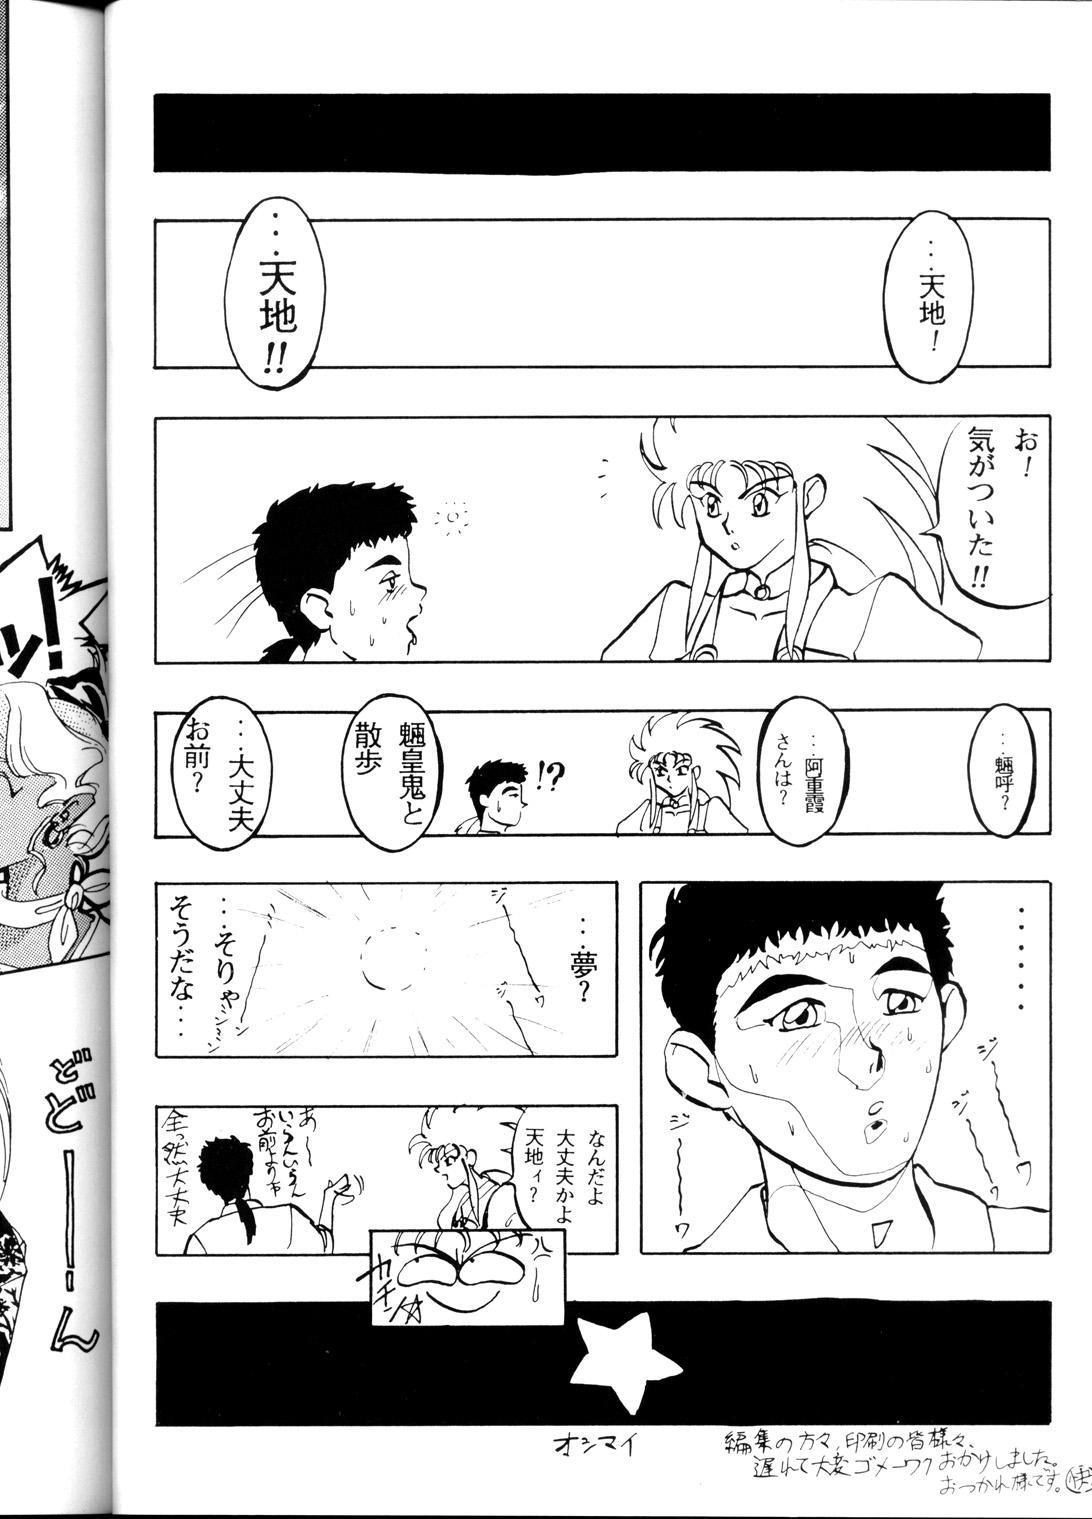 [B.B.C] Tenchi Muyou! Ryou-ou-ki Kaiteiben (Tenchi Muyou!) 50